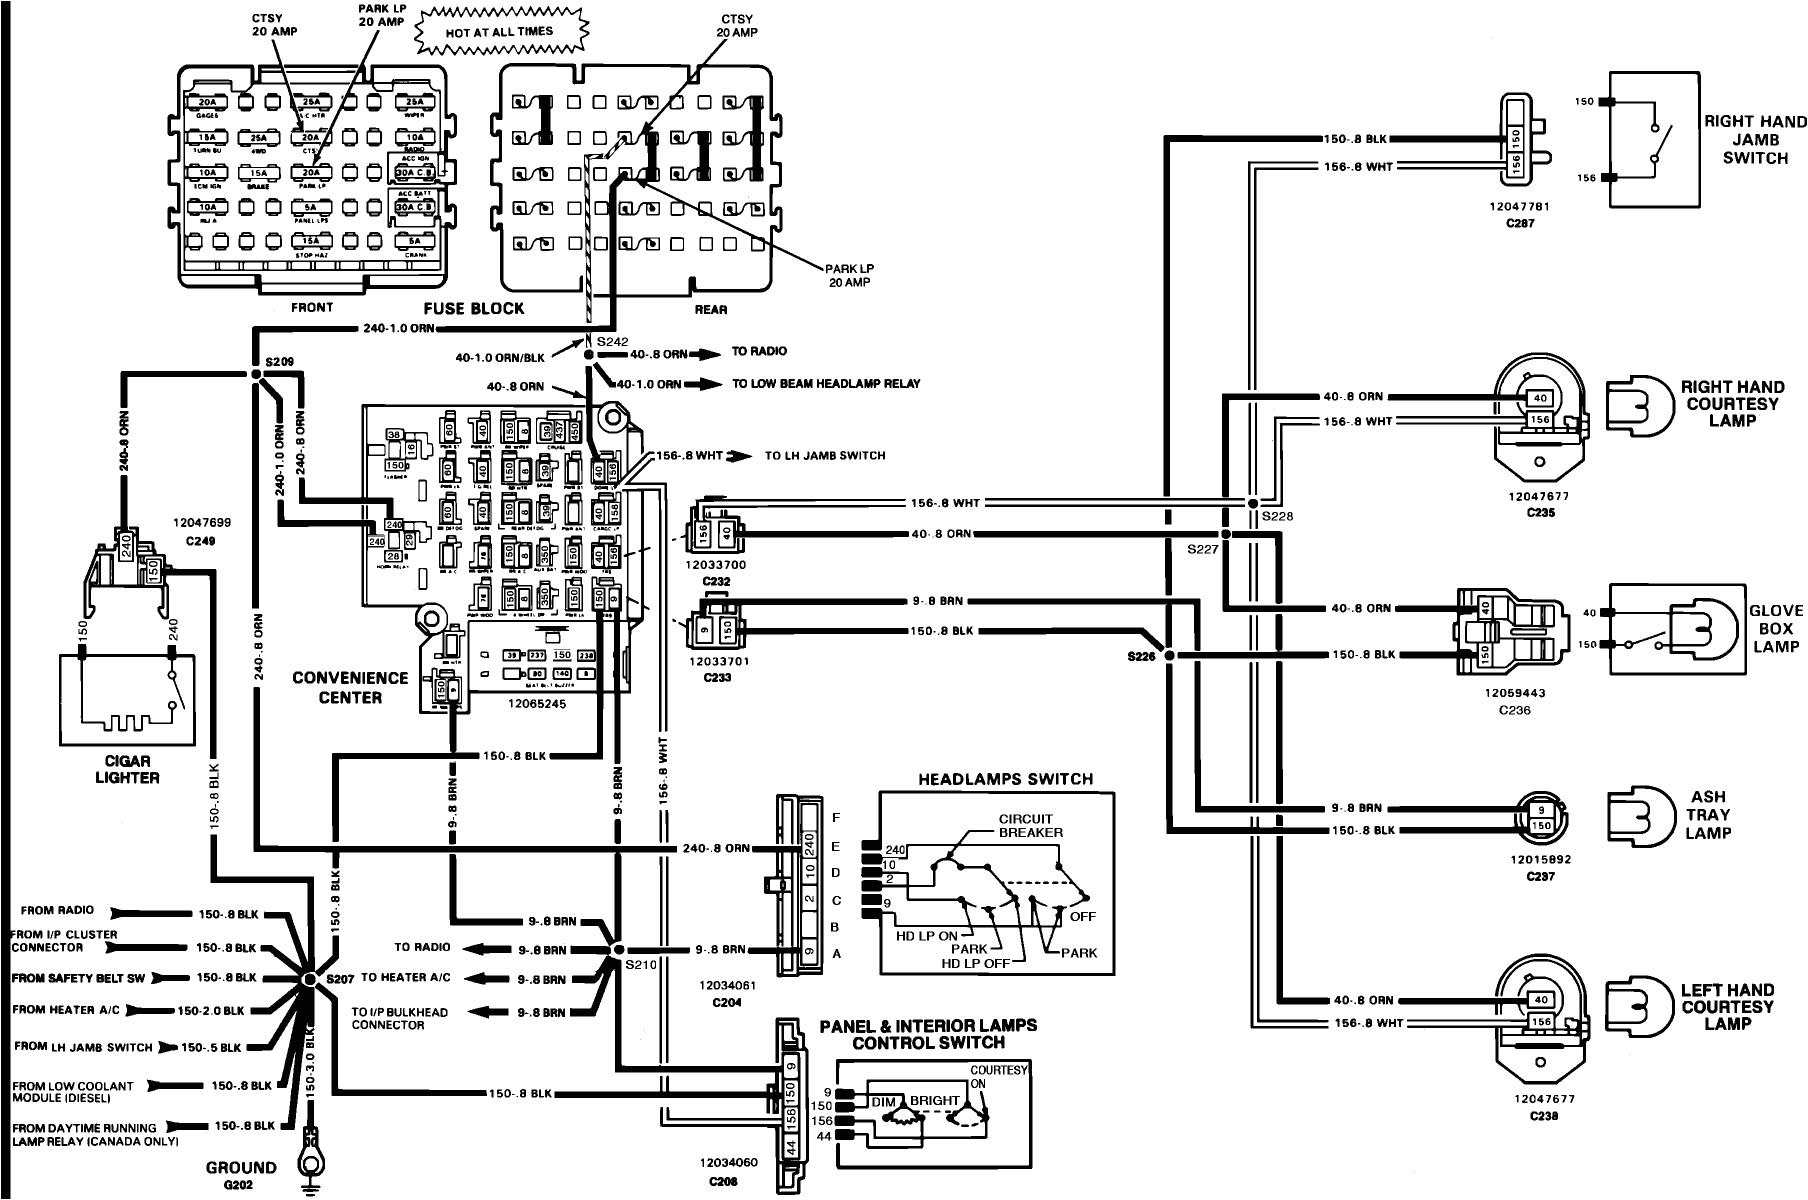 1990 s10 wiring diagram pdf ohiorising org throughout 1995 chevy silverado in 1995 gmc sierra wiring diagram gif